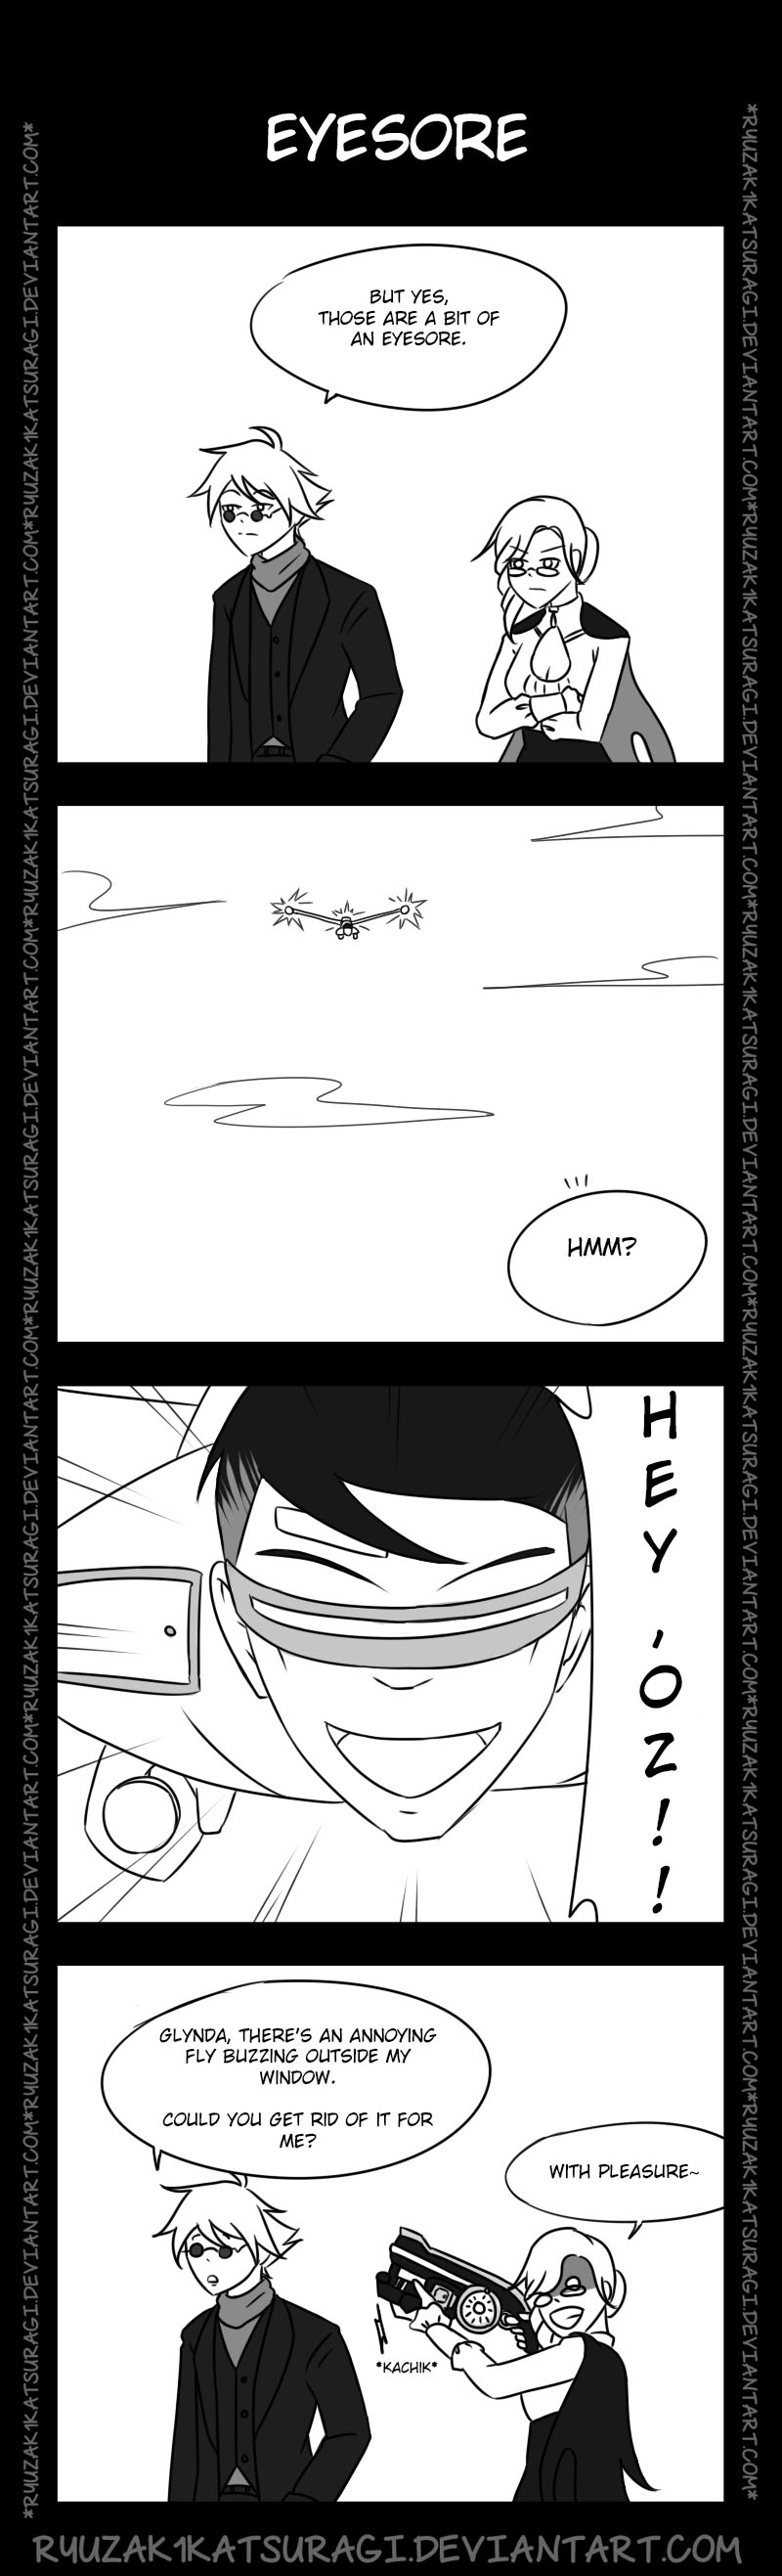 [RWBY] Eyesore by Ryuzak1Katsuragi